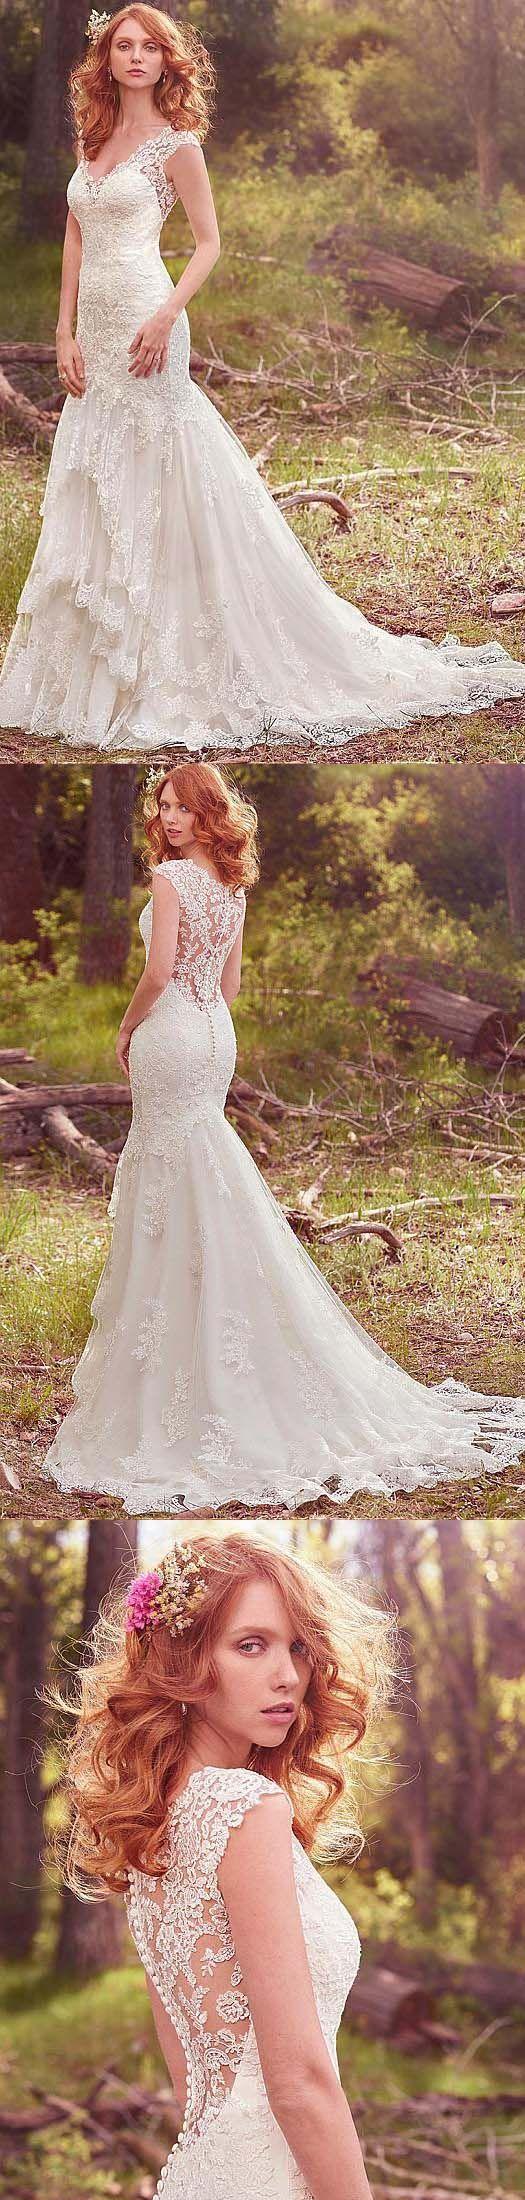 unique mermaid wedding dresses ideas mermaid wedding dresses